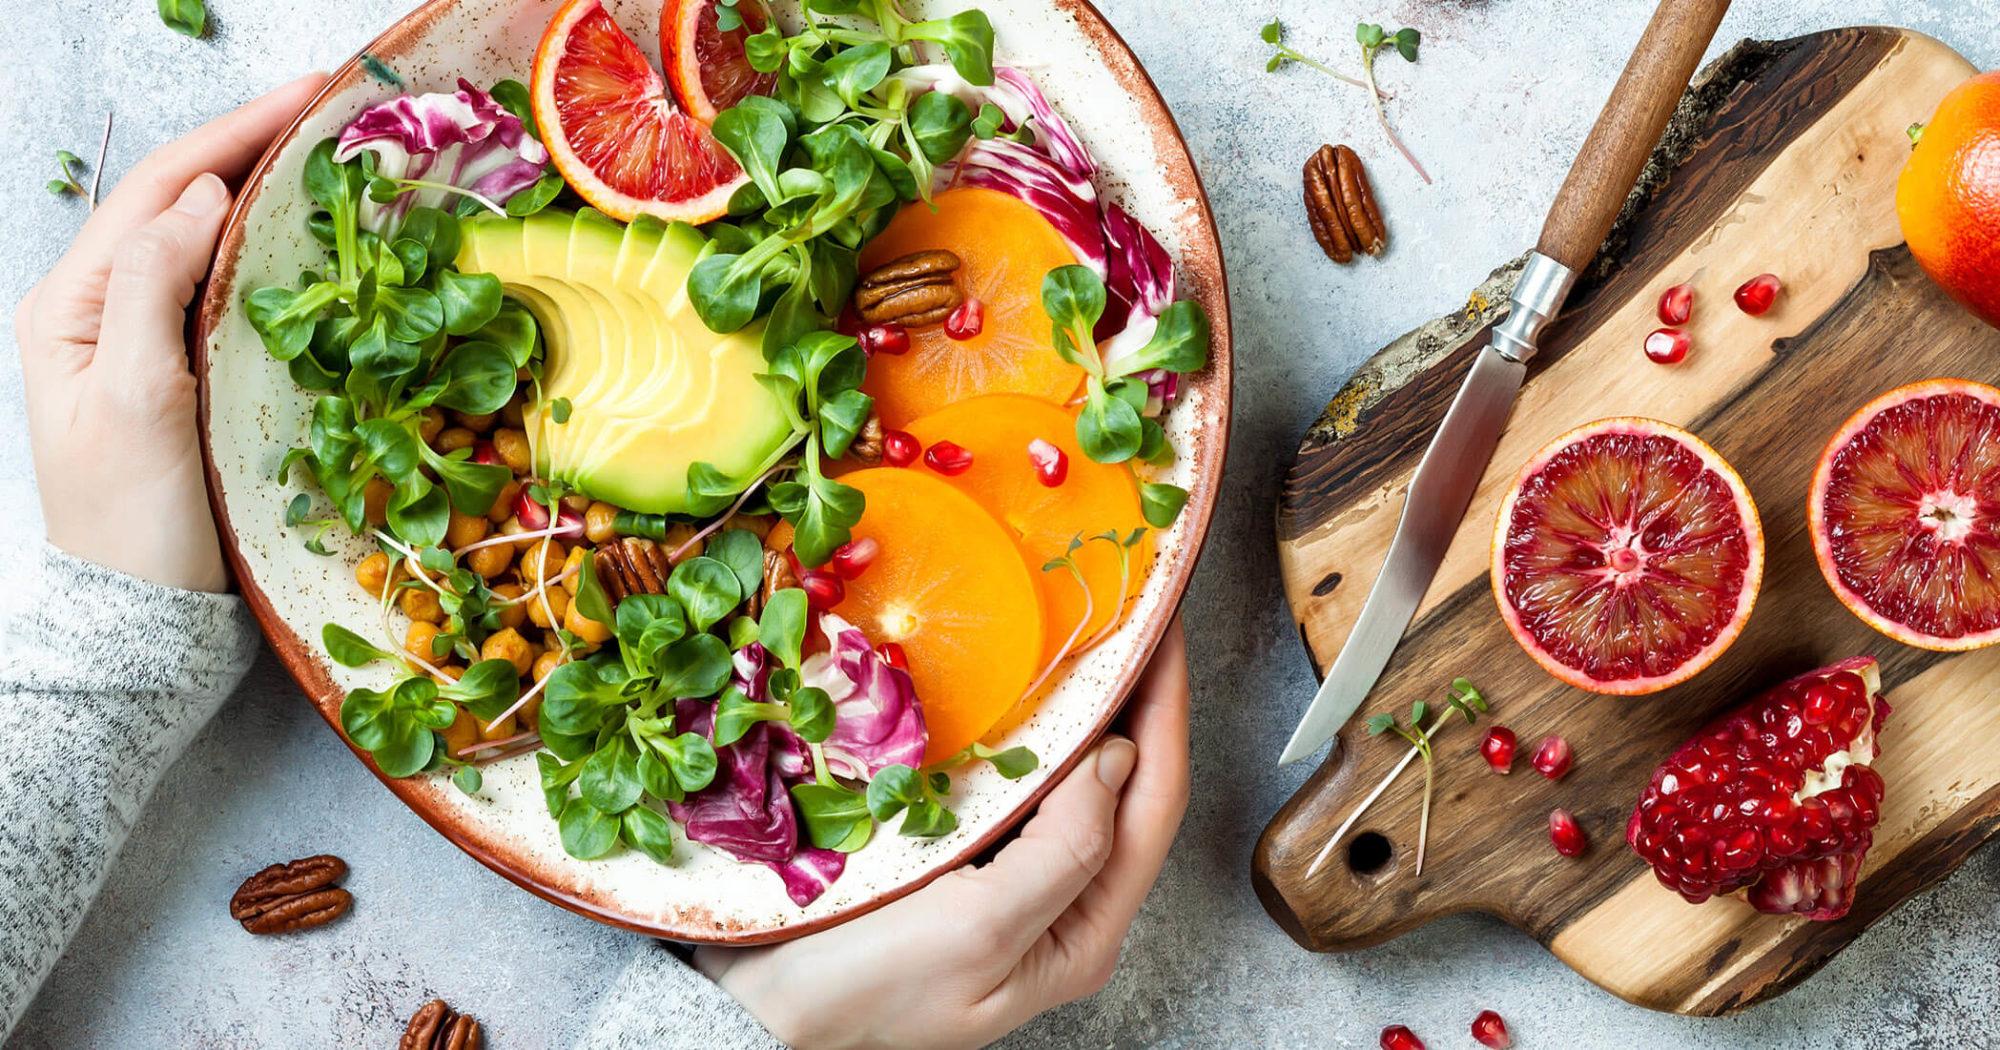 dementia prevention in a vegan diet